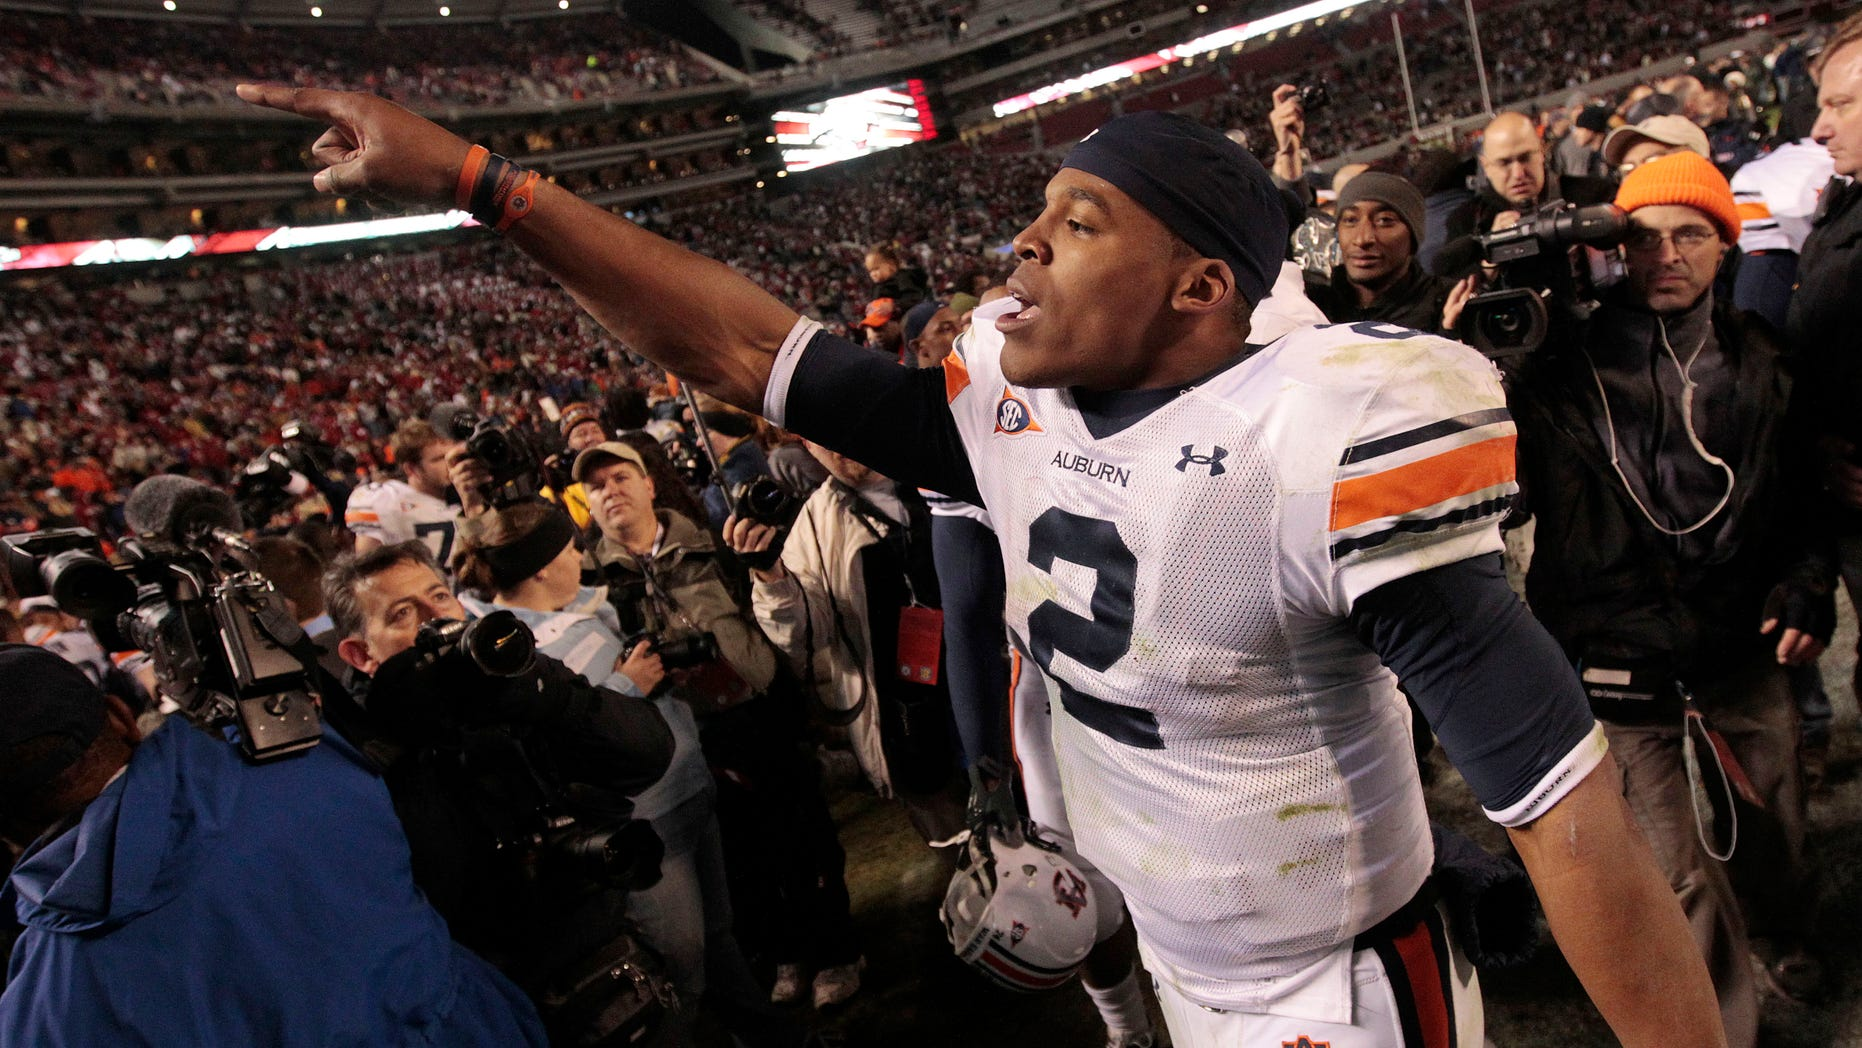 Nov. 26: Auburn quarterback Cameron Newton celebrates after their 28-27 win over Alabama in an NCAA college football game at Bryant-Denny Stadium in Tuscaloosa, Ala.